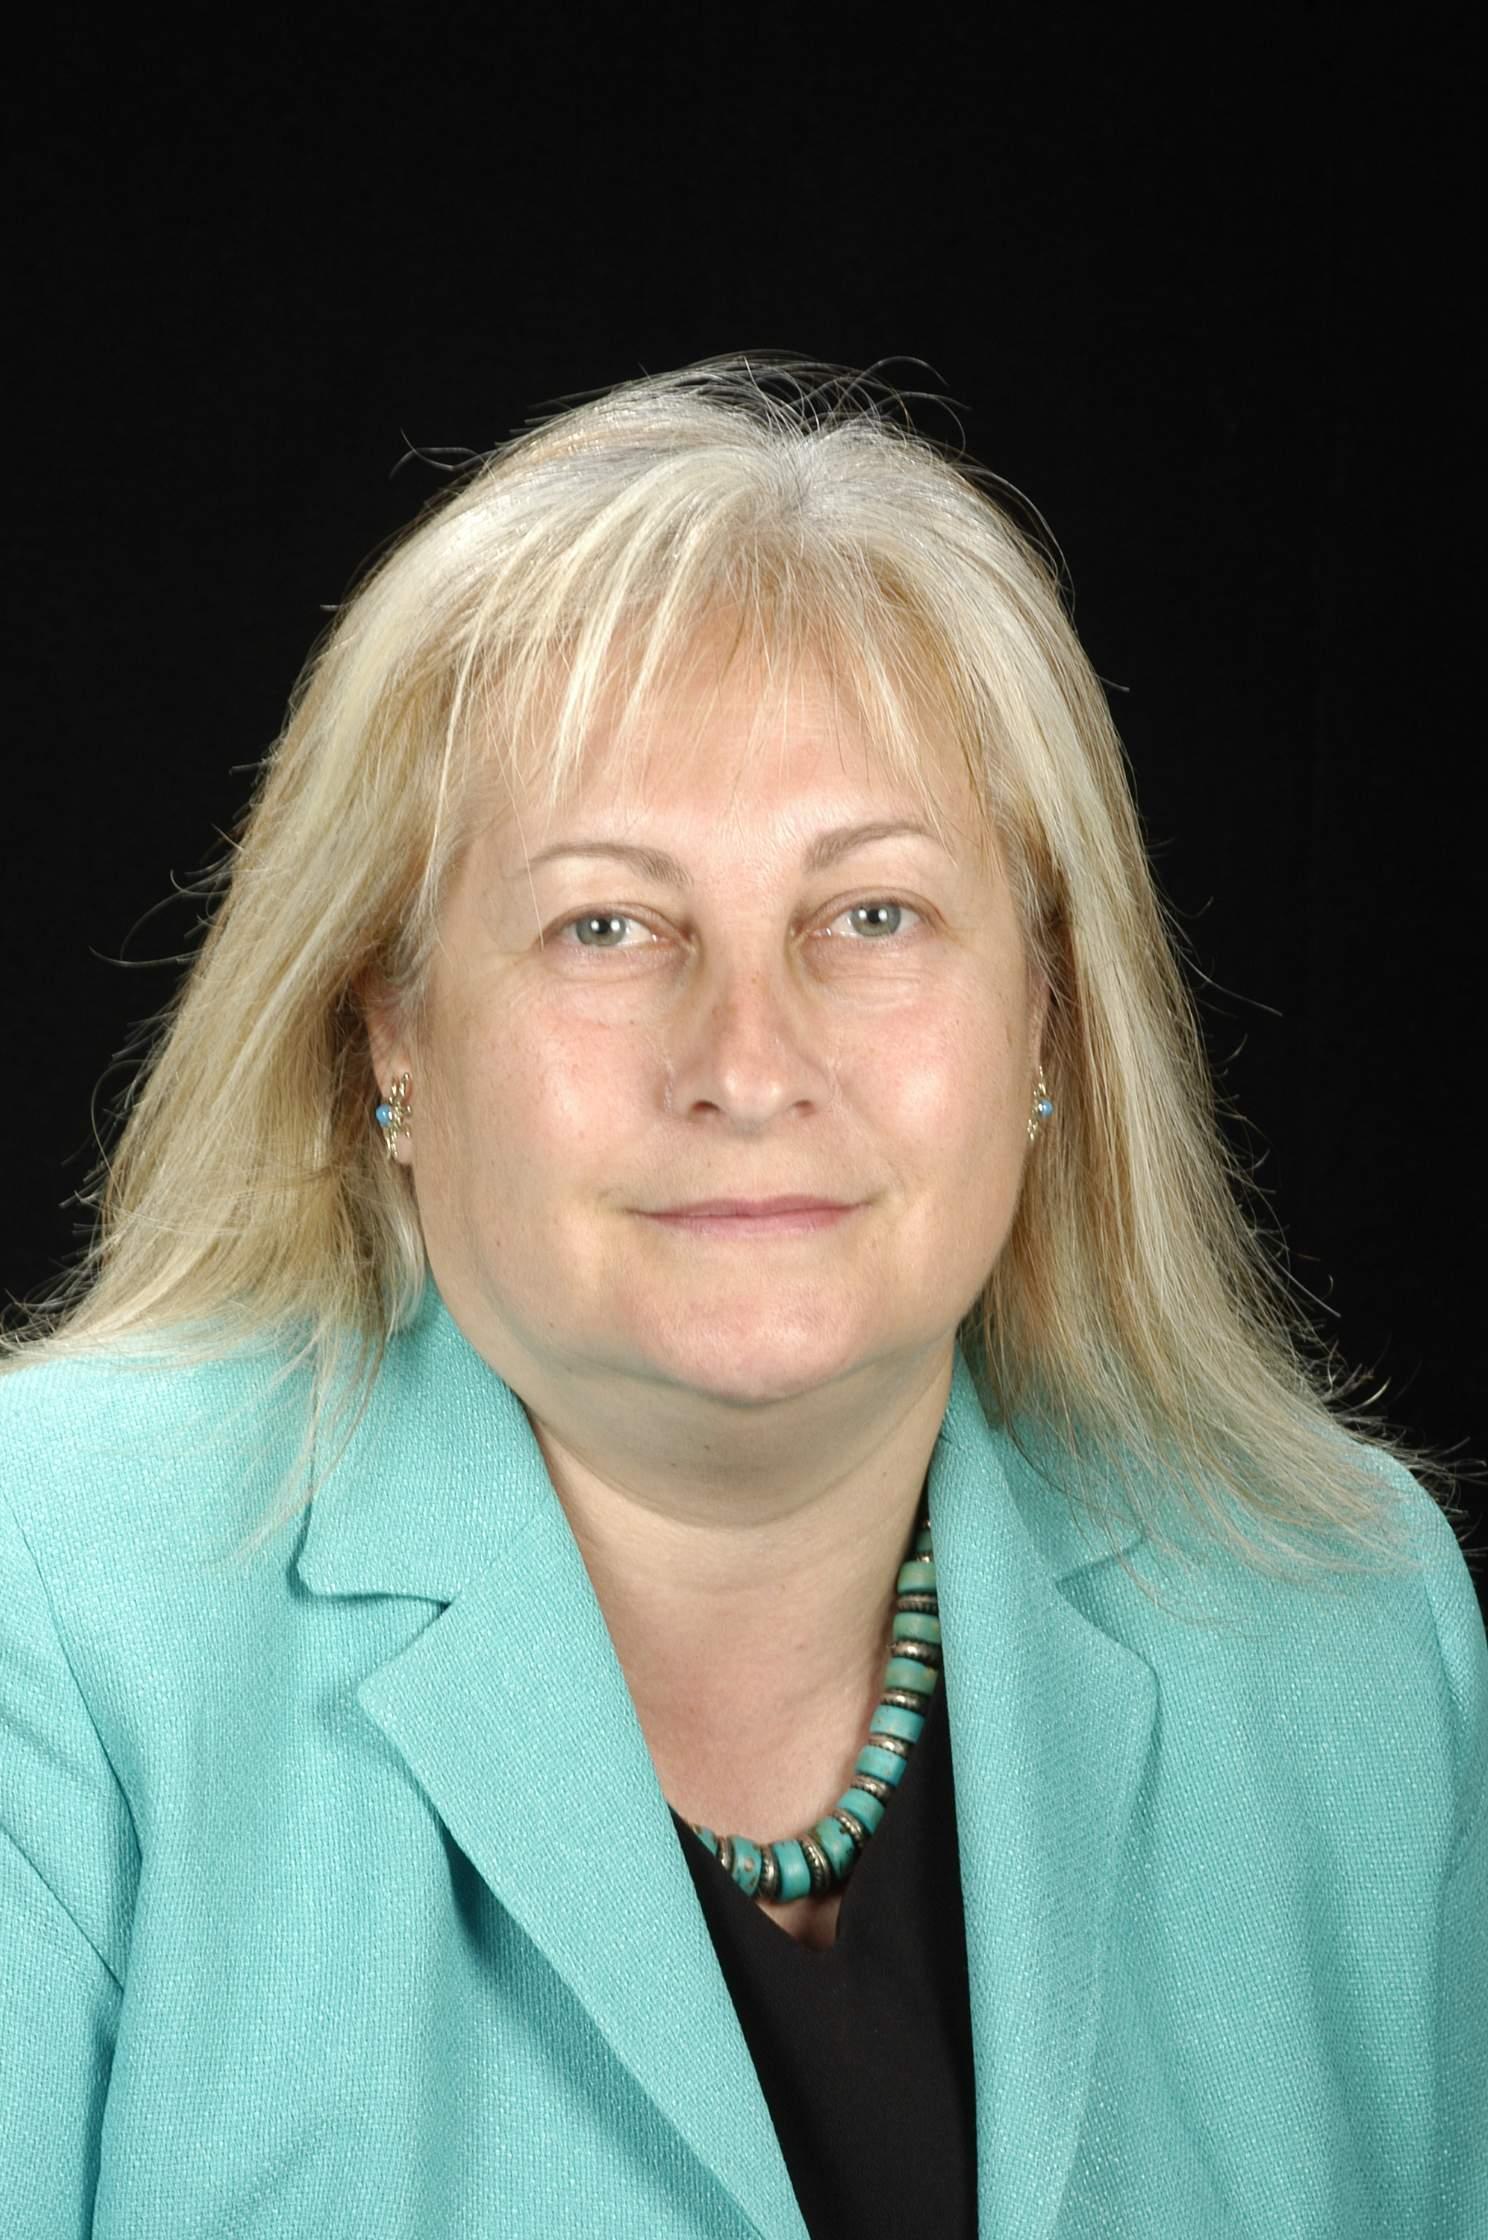 Dra. Isabel Carvajal Lizano